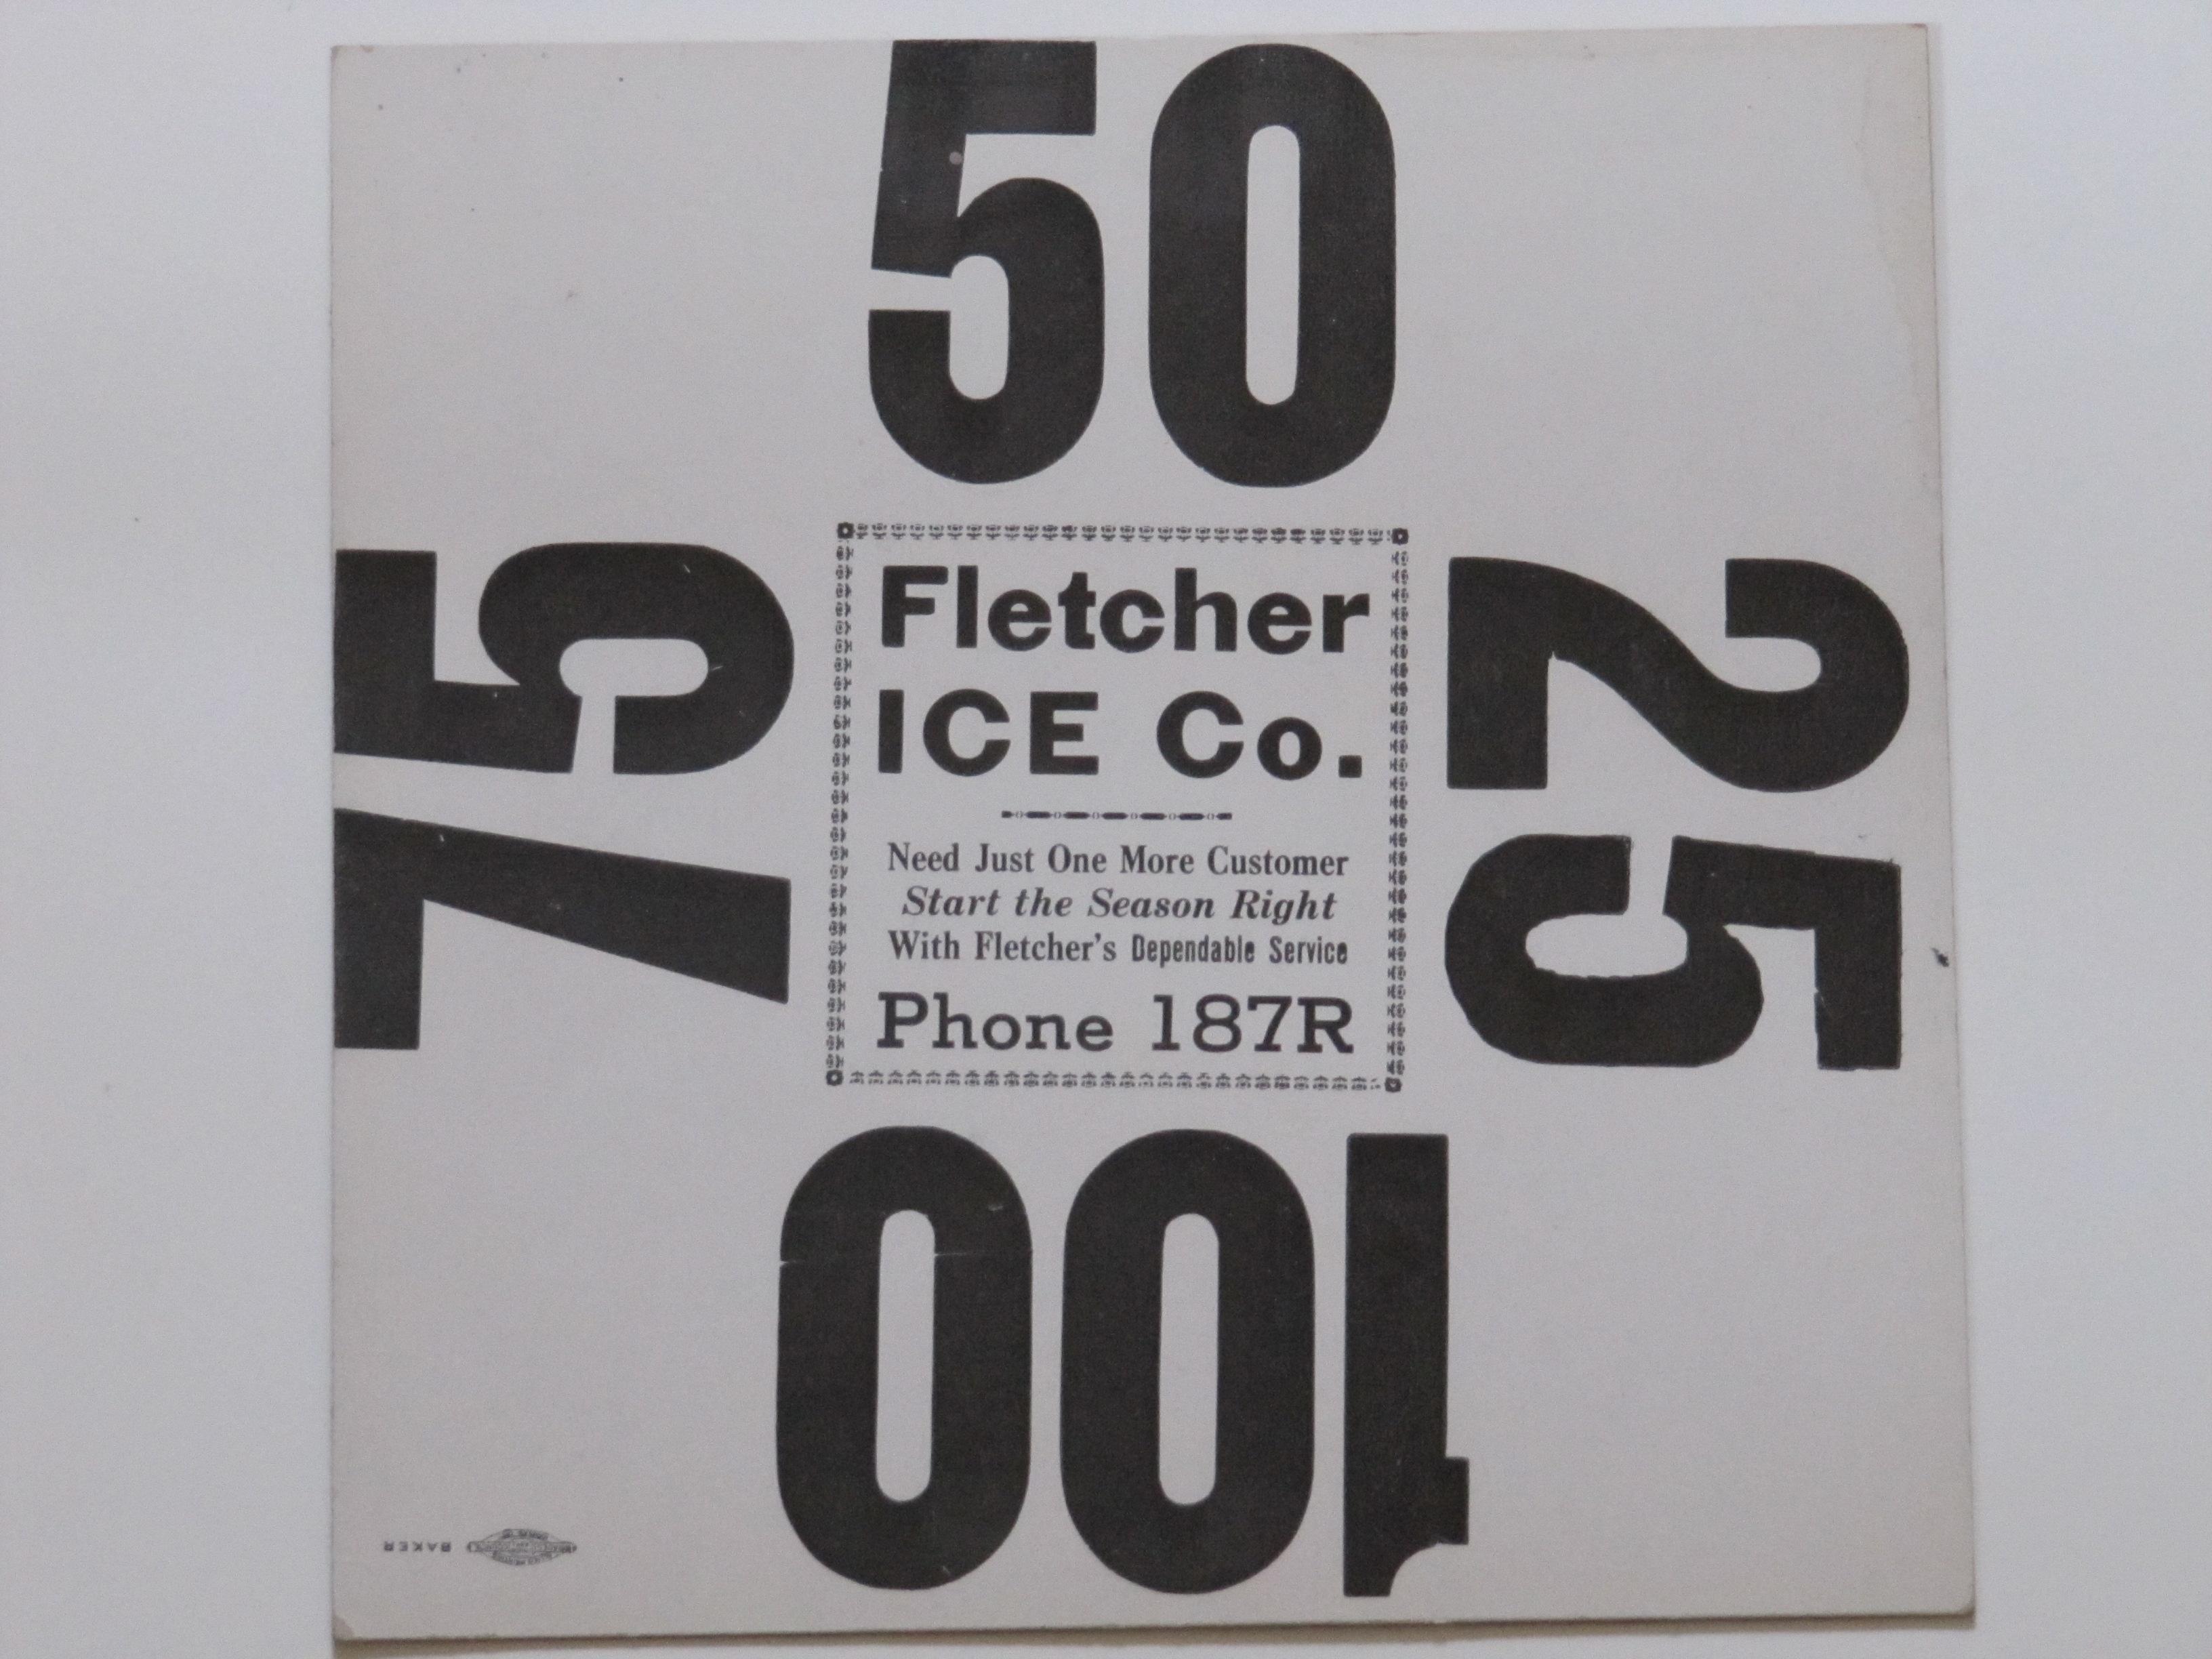 Fletcher Ice Co.